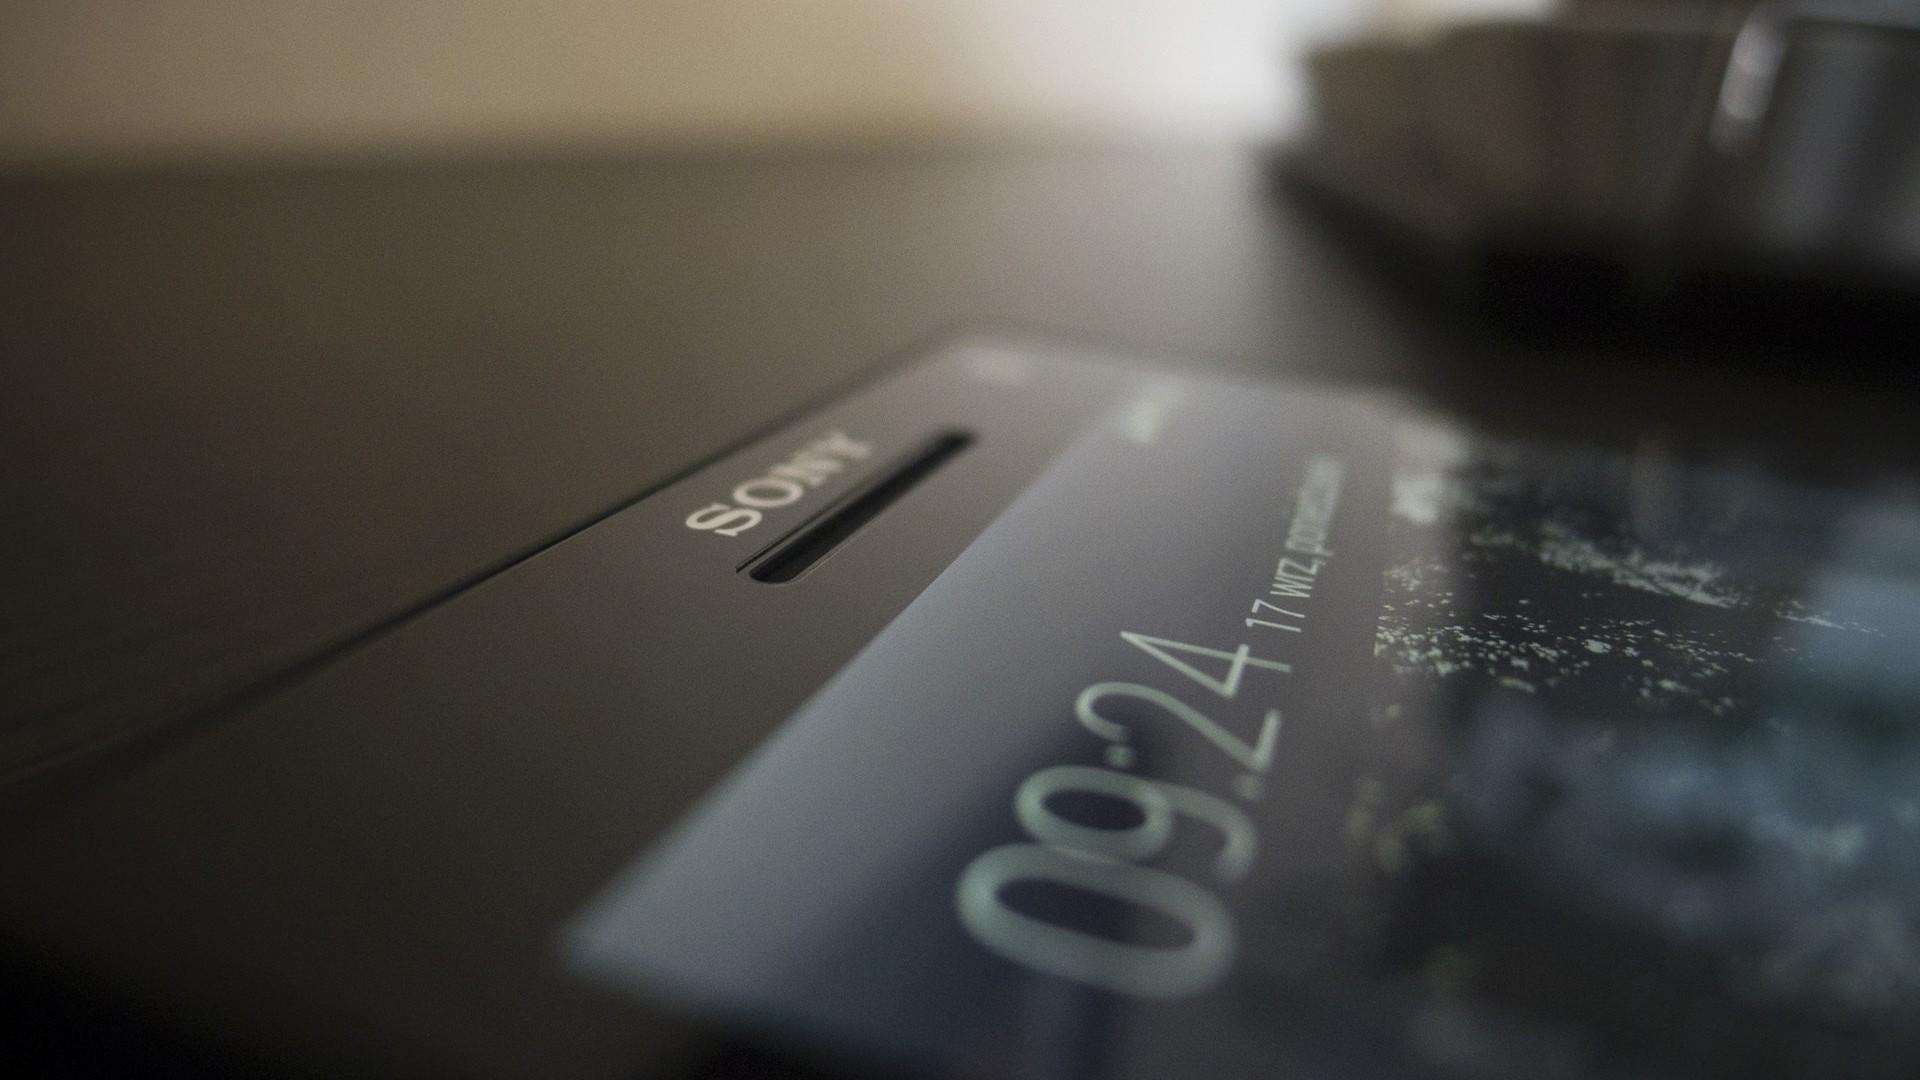 Full HD 1080p Tablet Wallpapers HD, Desktop Backgrounds 1920×1080